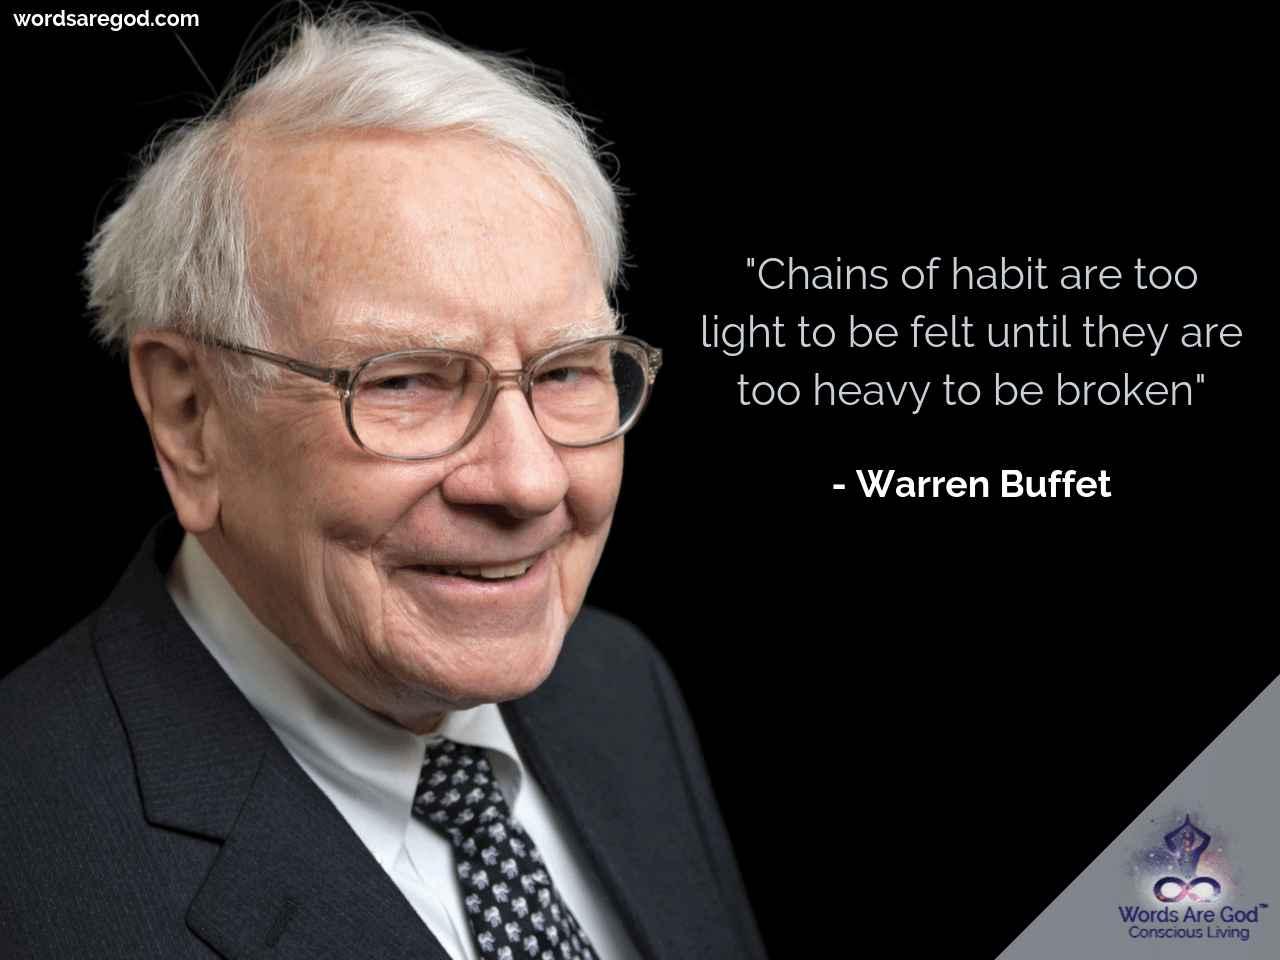 Wareen Buffet Inspirational Quote by Warren Buffet